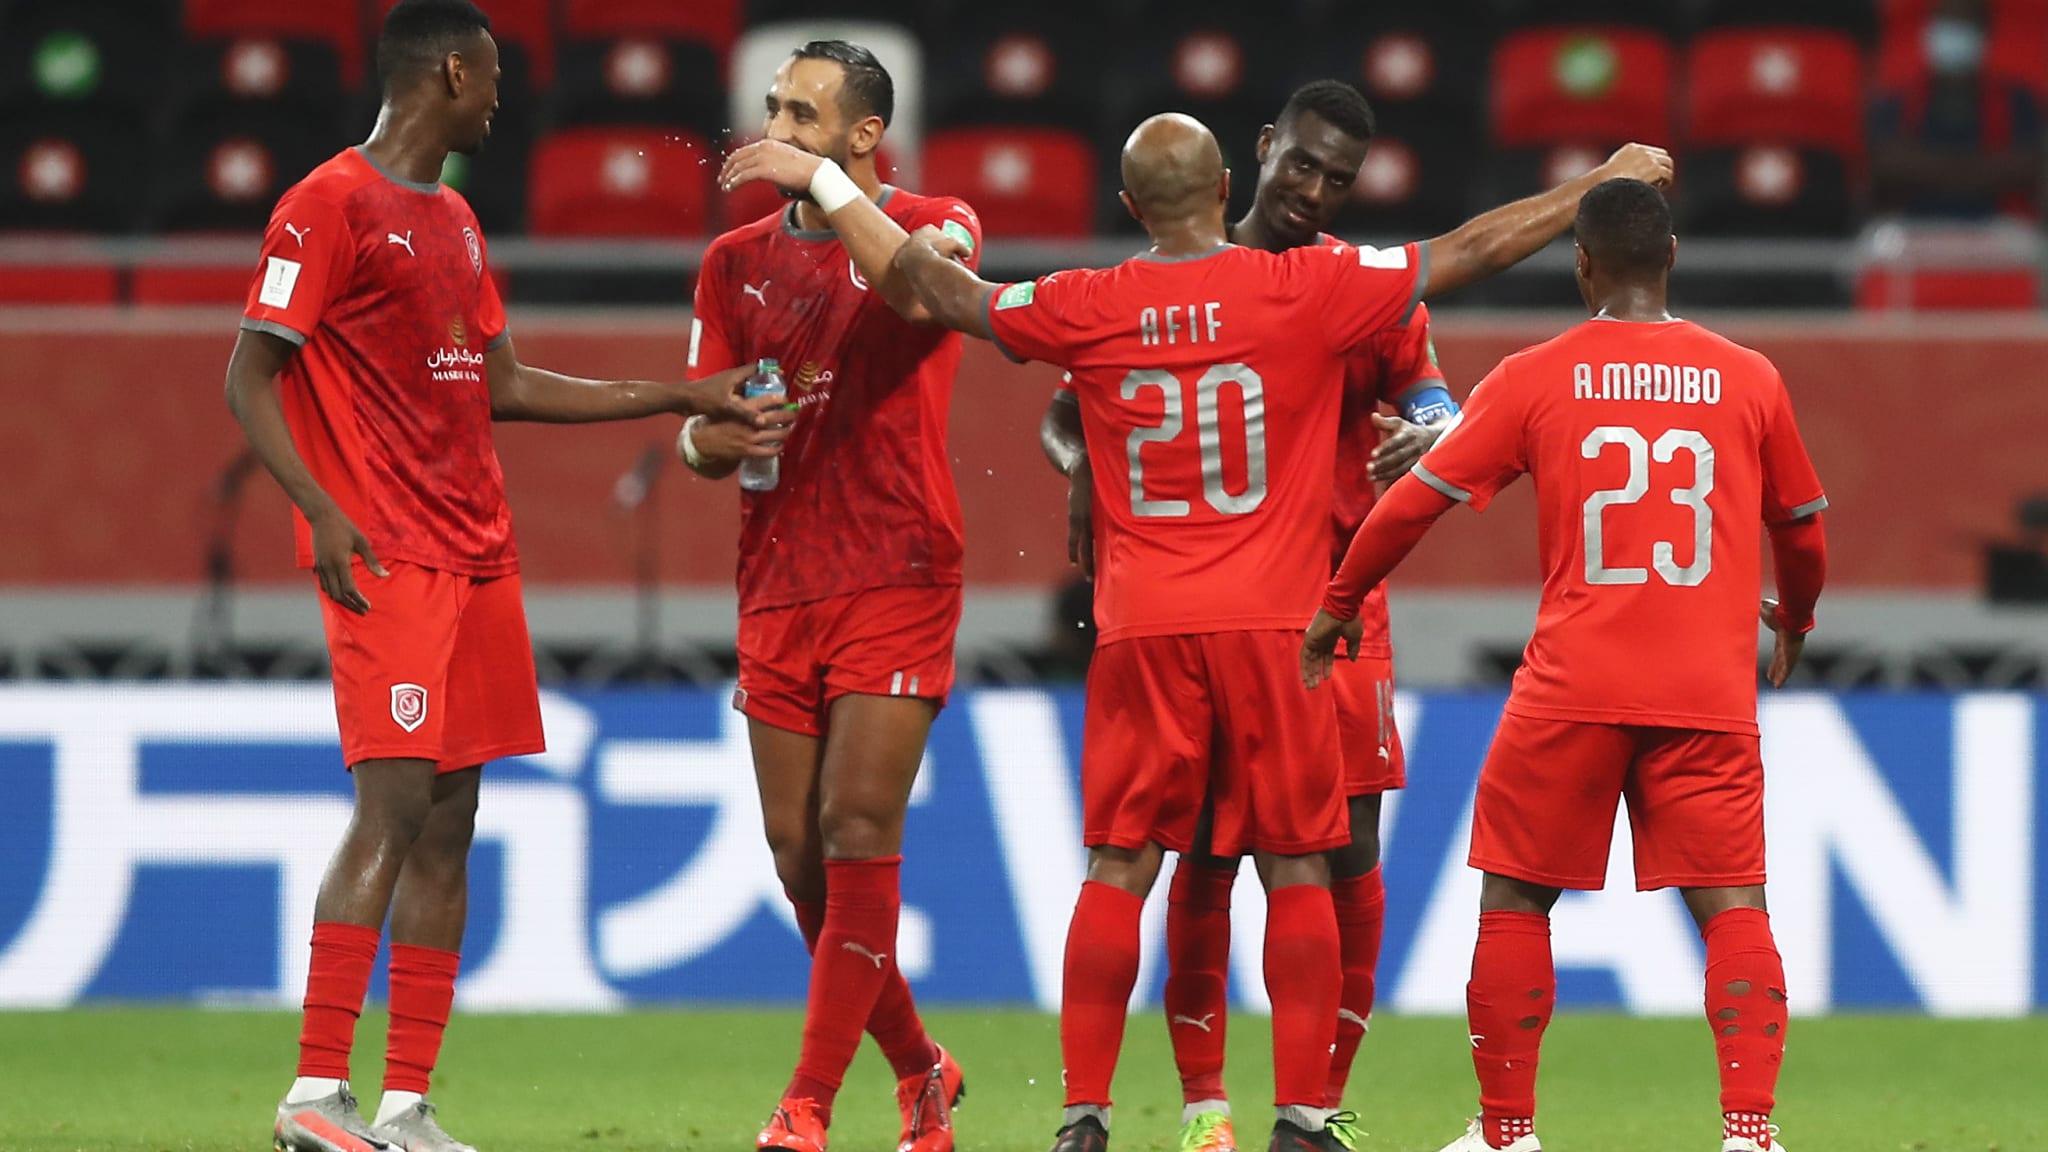 Almoez Ali of Al Duhail SC celebrates with teammate Ali Afif